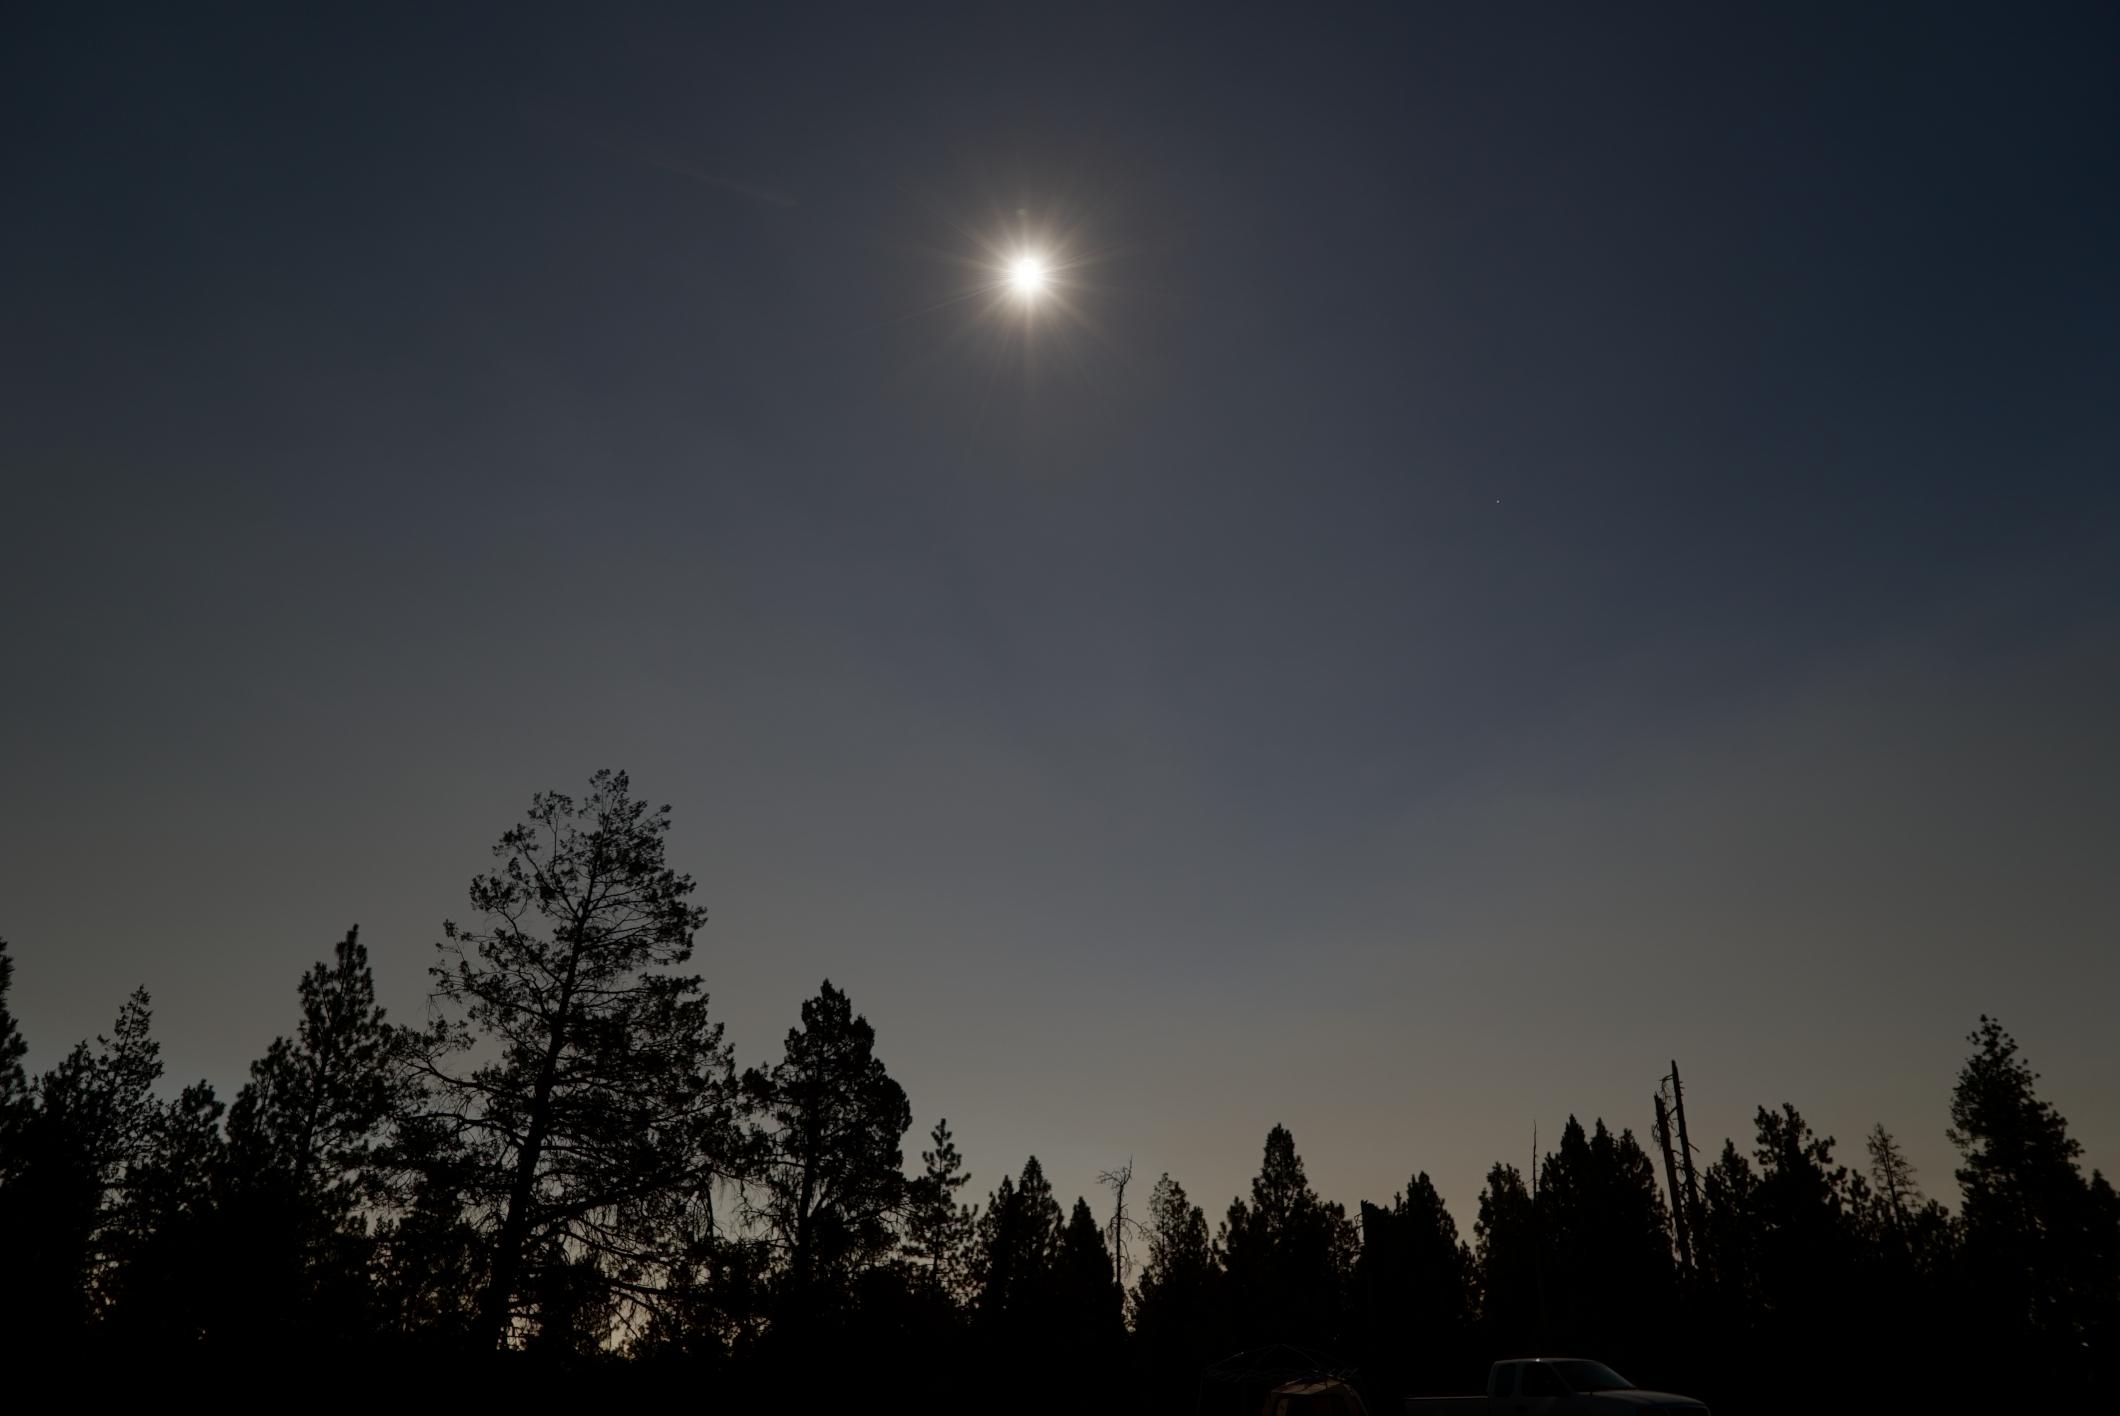 eclipse210817-17h20m45-24mmf4i4b.jpg